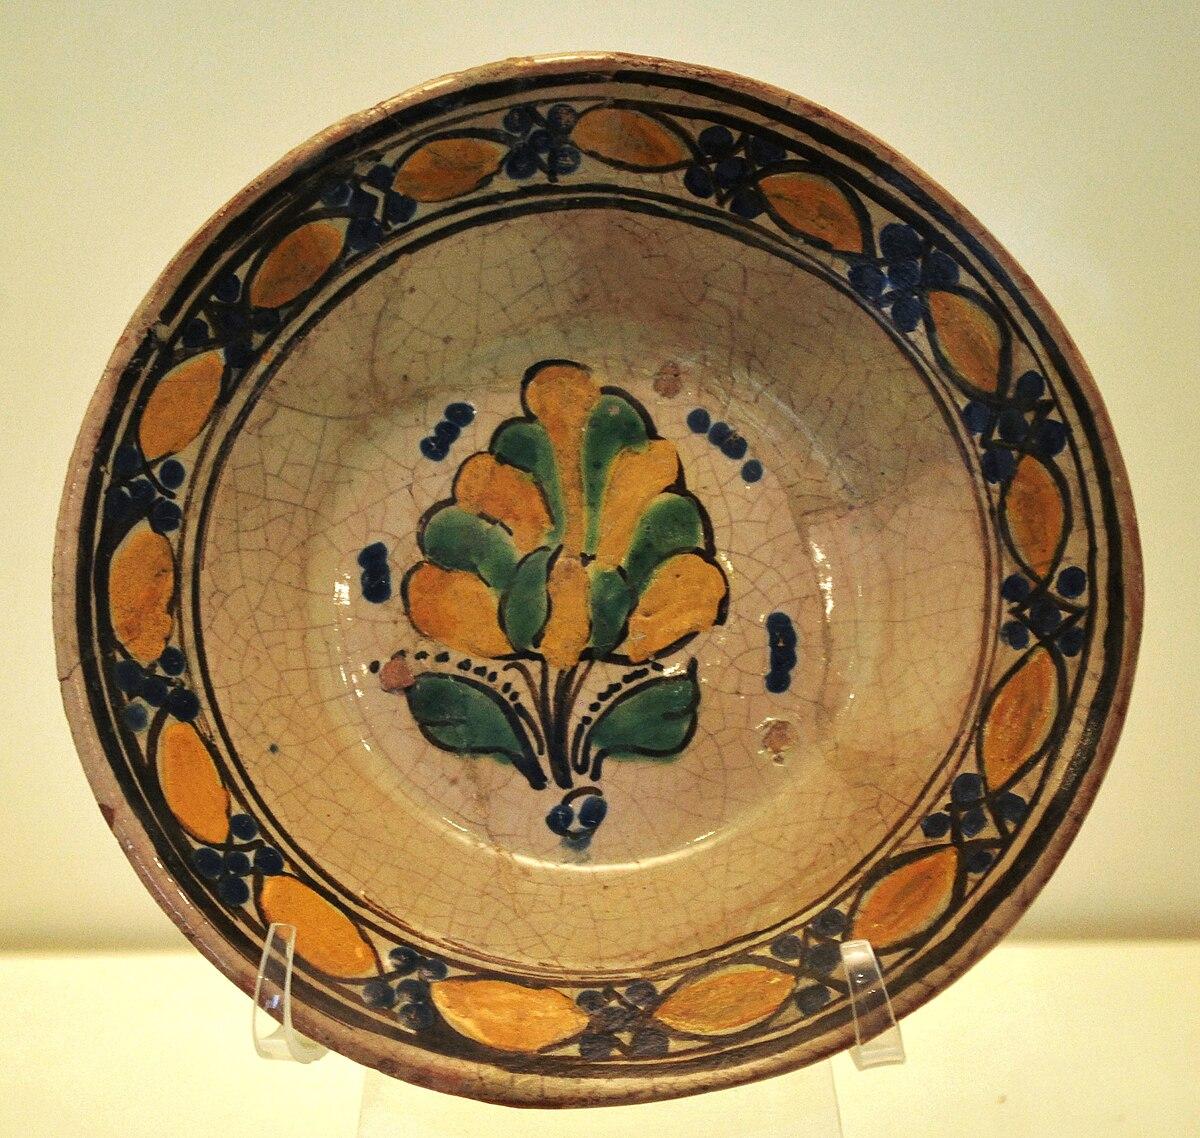 Fayenza wikipedia la enciclopedia libre for Fabricantes de ceramica en mexico